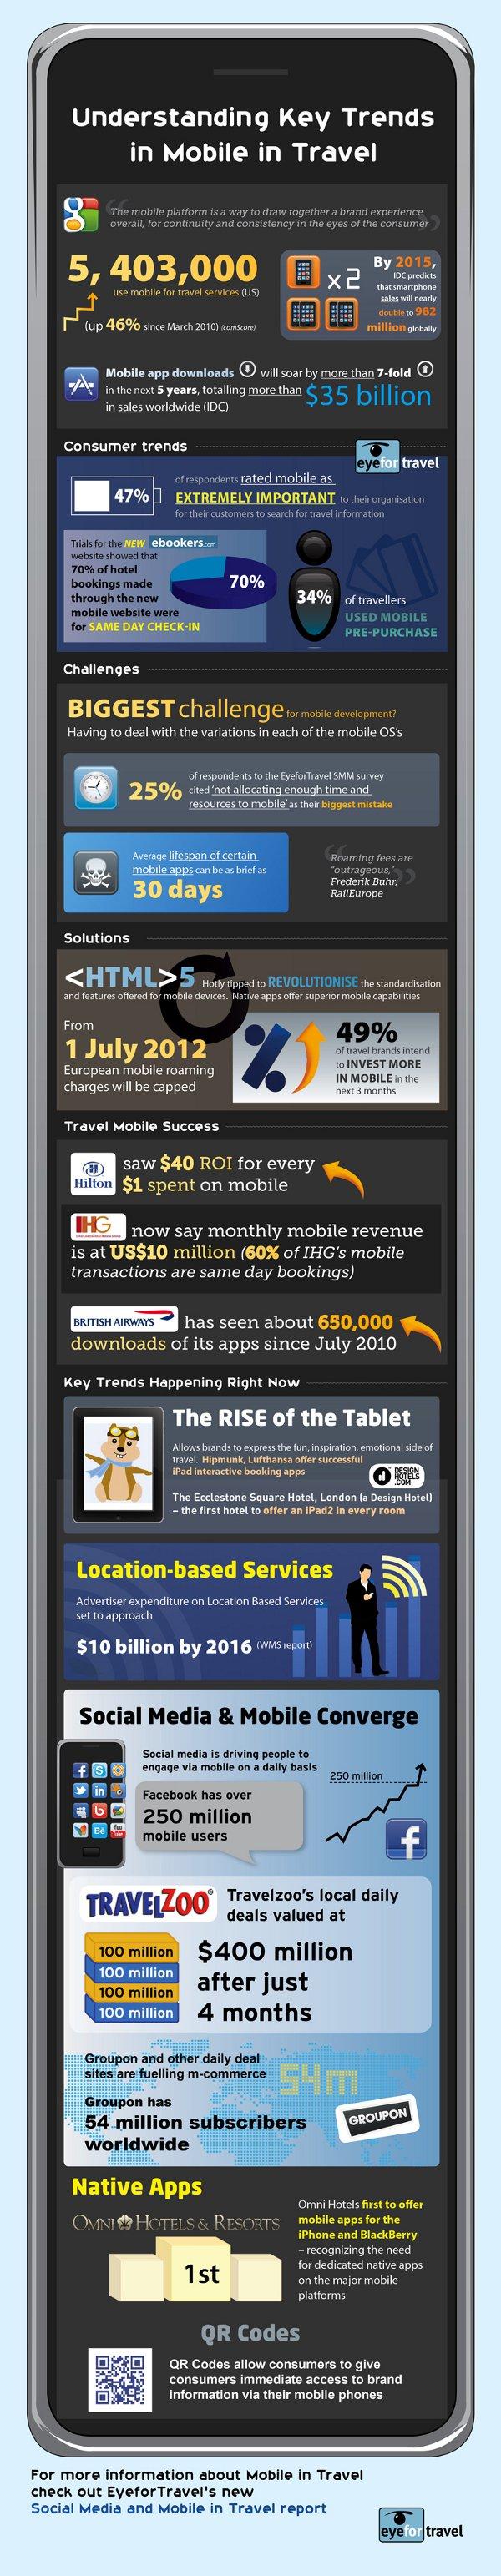 EyeforTravel infographic